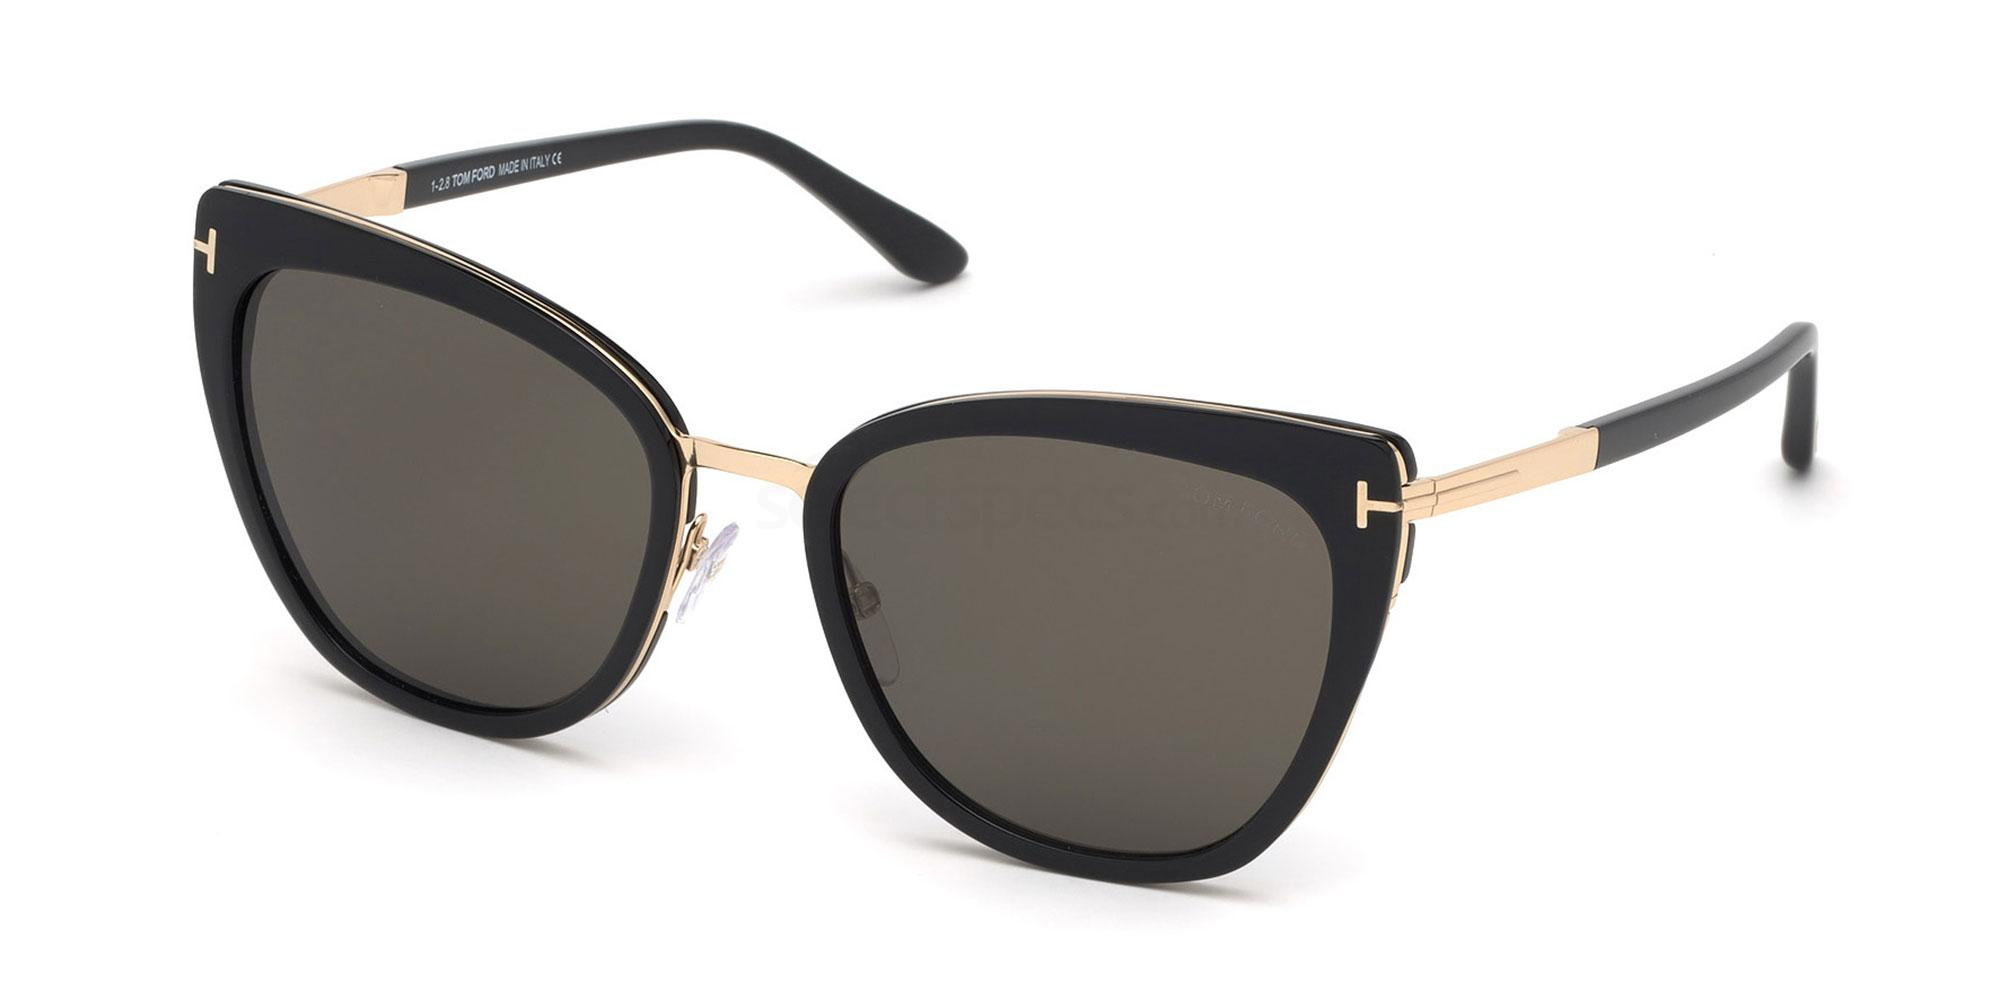 01A FT0717 Sunglasses, Tom Ford